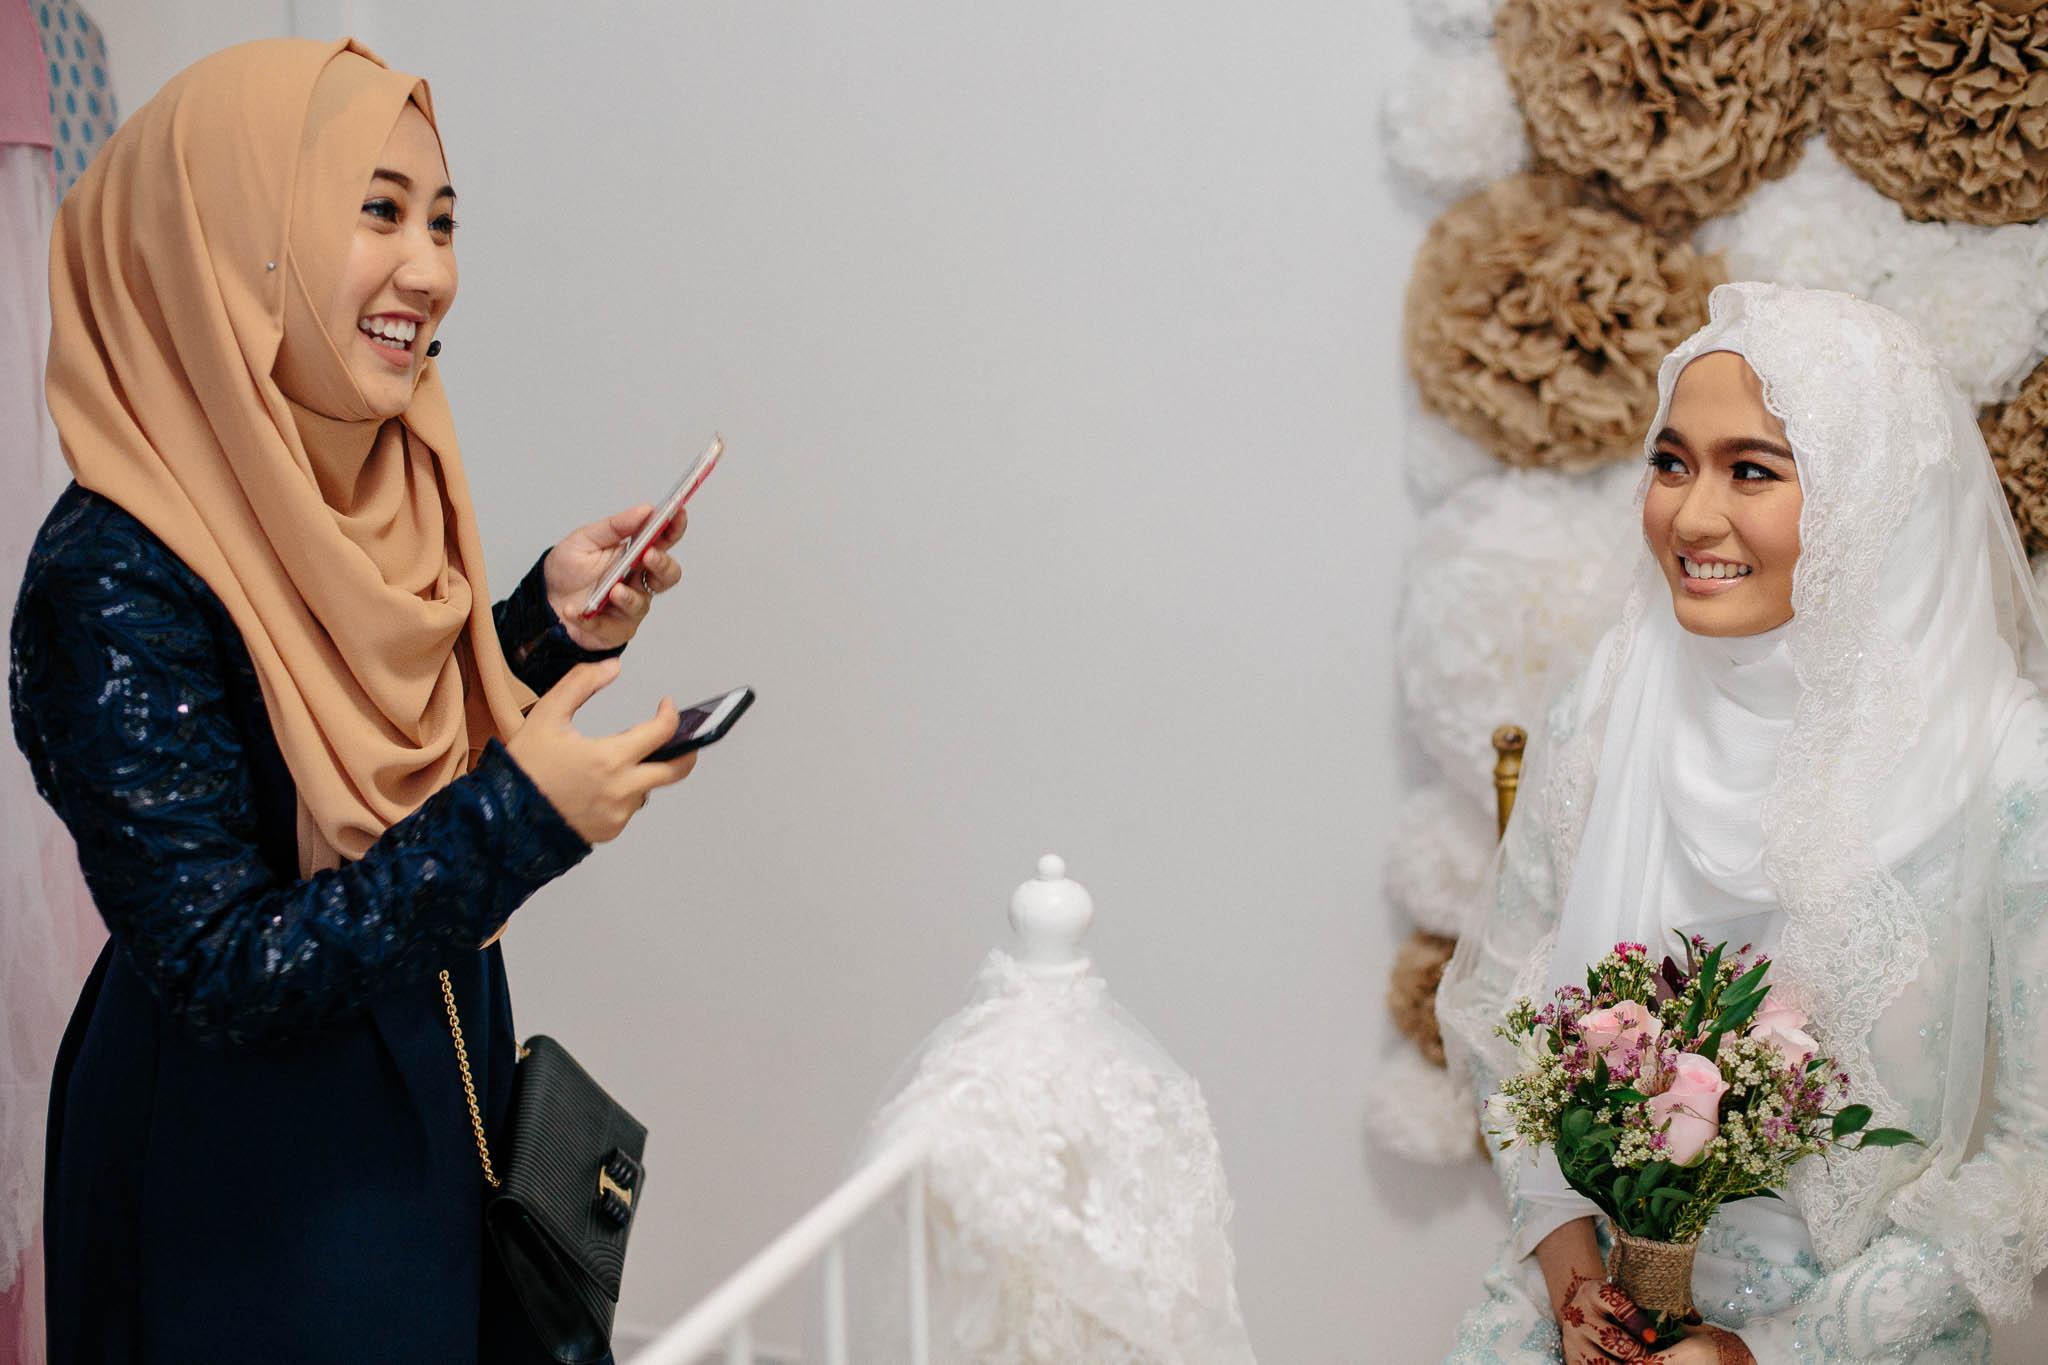 singapore-wedding-photographer-sharalyn-syazwan-006.jpg